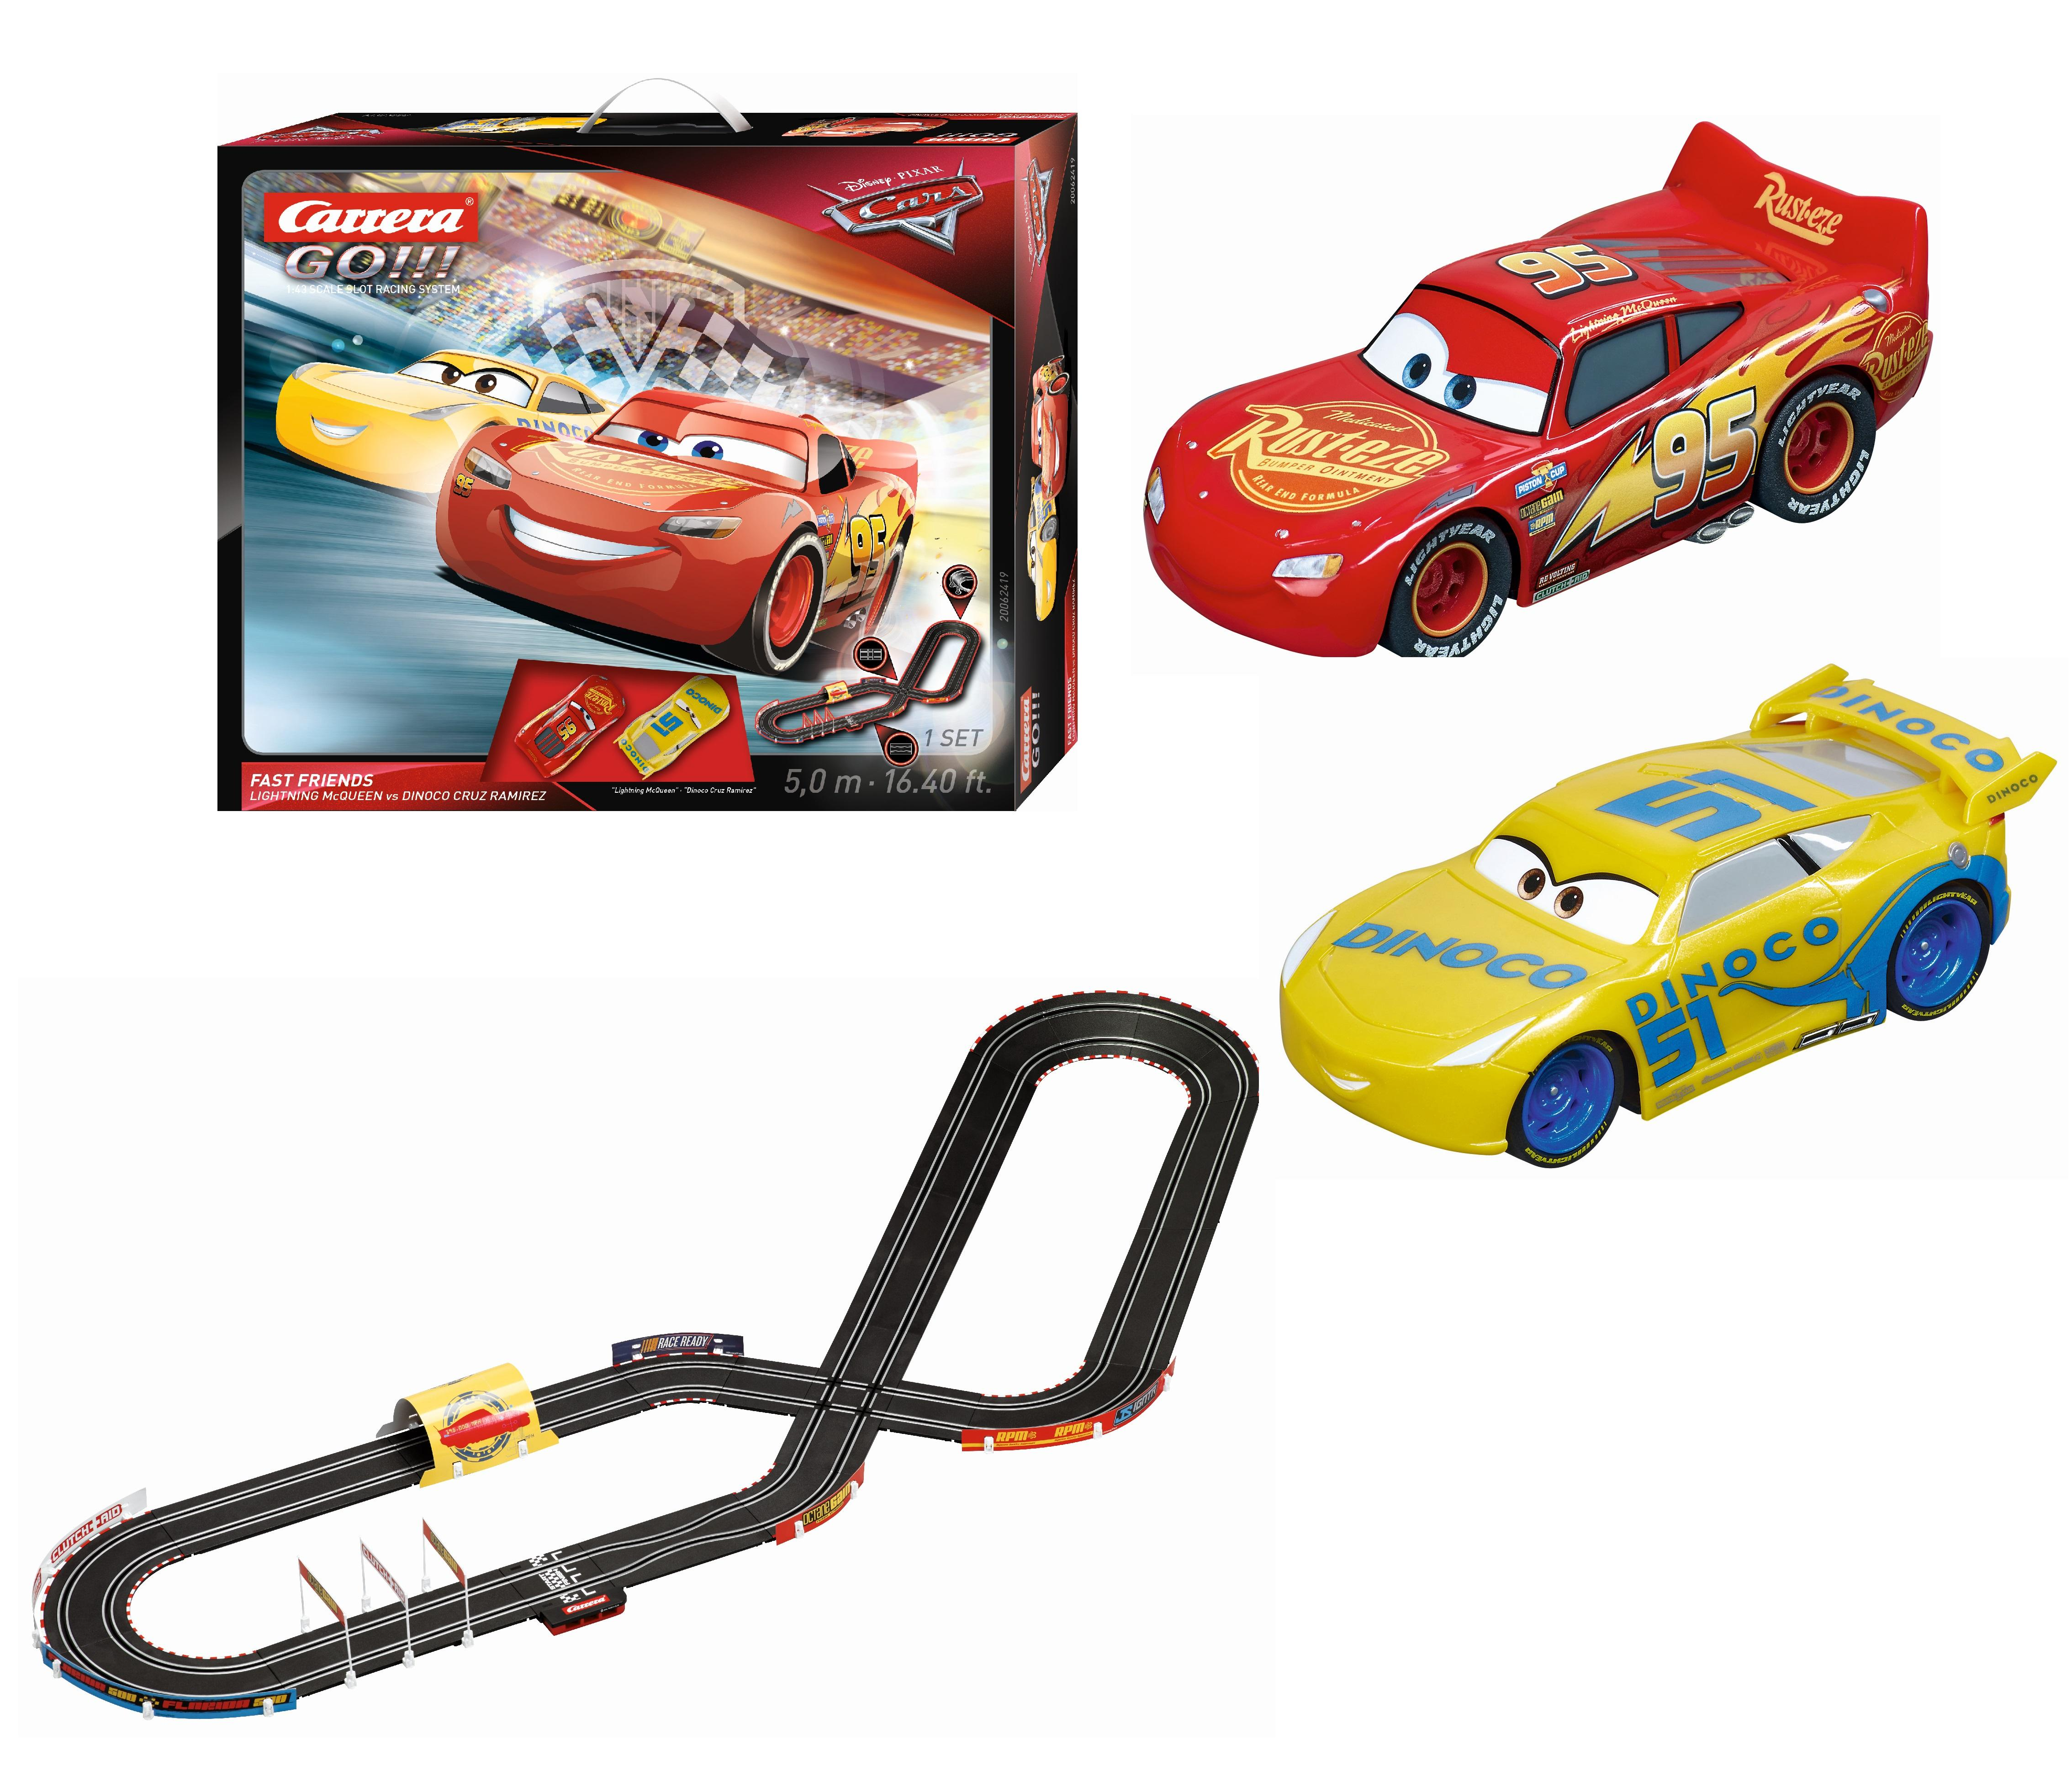 carrera 62419 go disney pixar cars 3 fast friends slot car race set race tracks amazon canada. Black Bedroom Furniture Sets. Home Design Ideas